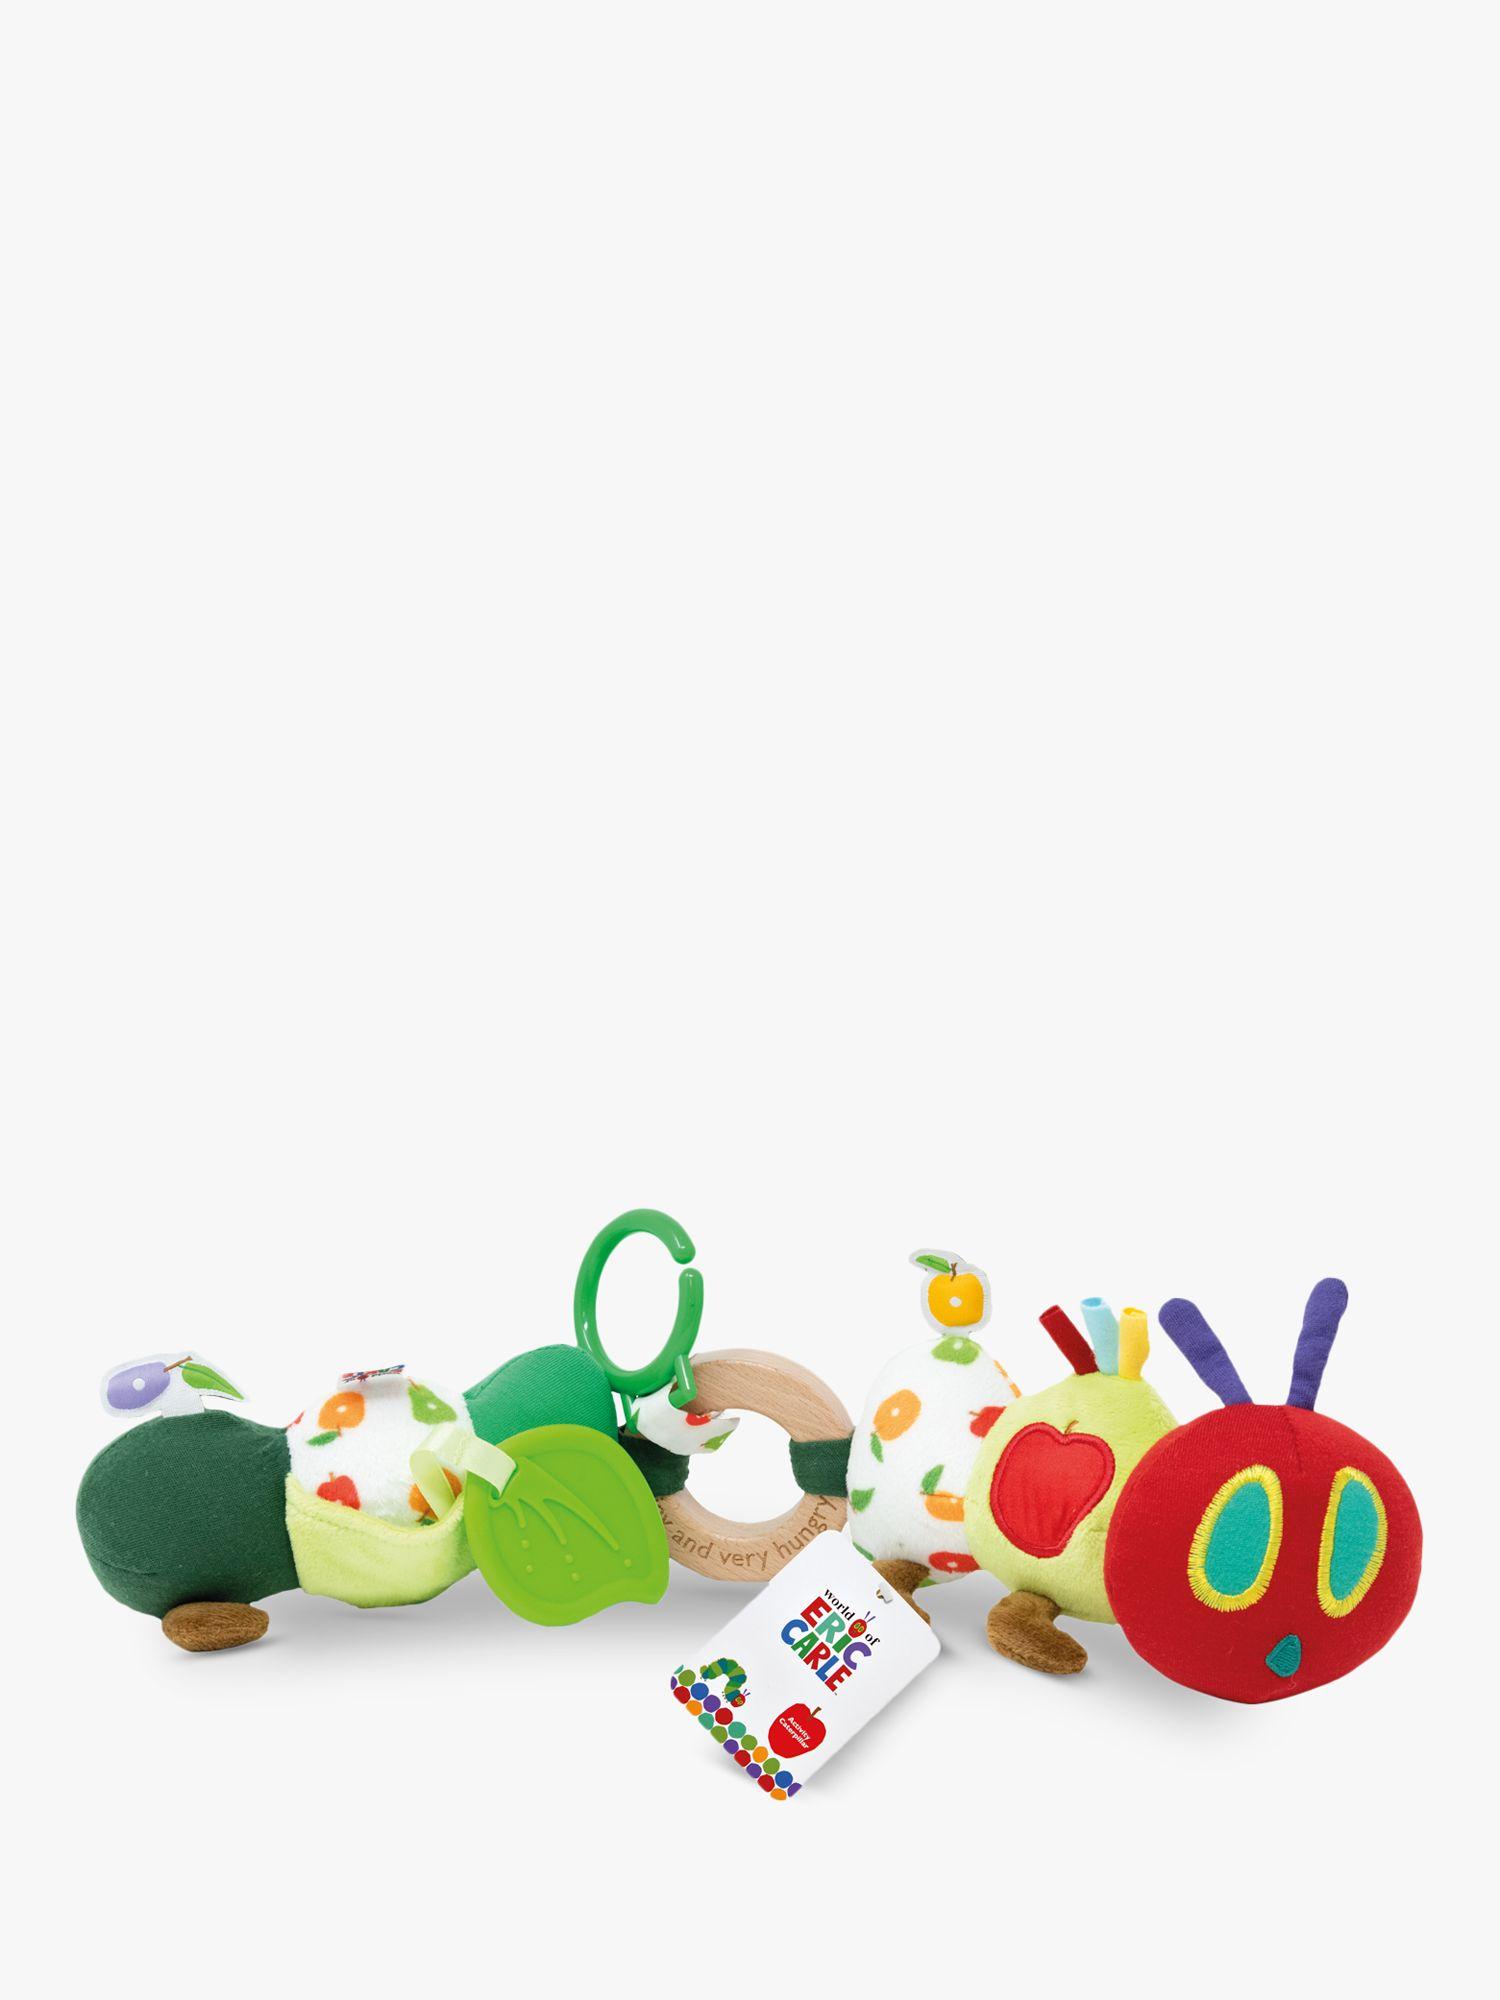 Rainbow Designs Very Hungry Caterpillar Tiny Caterpillar Activity Toy